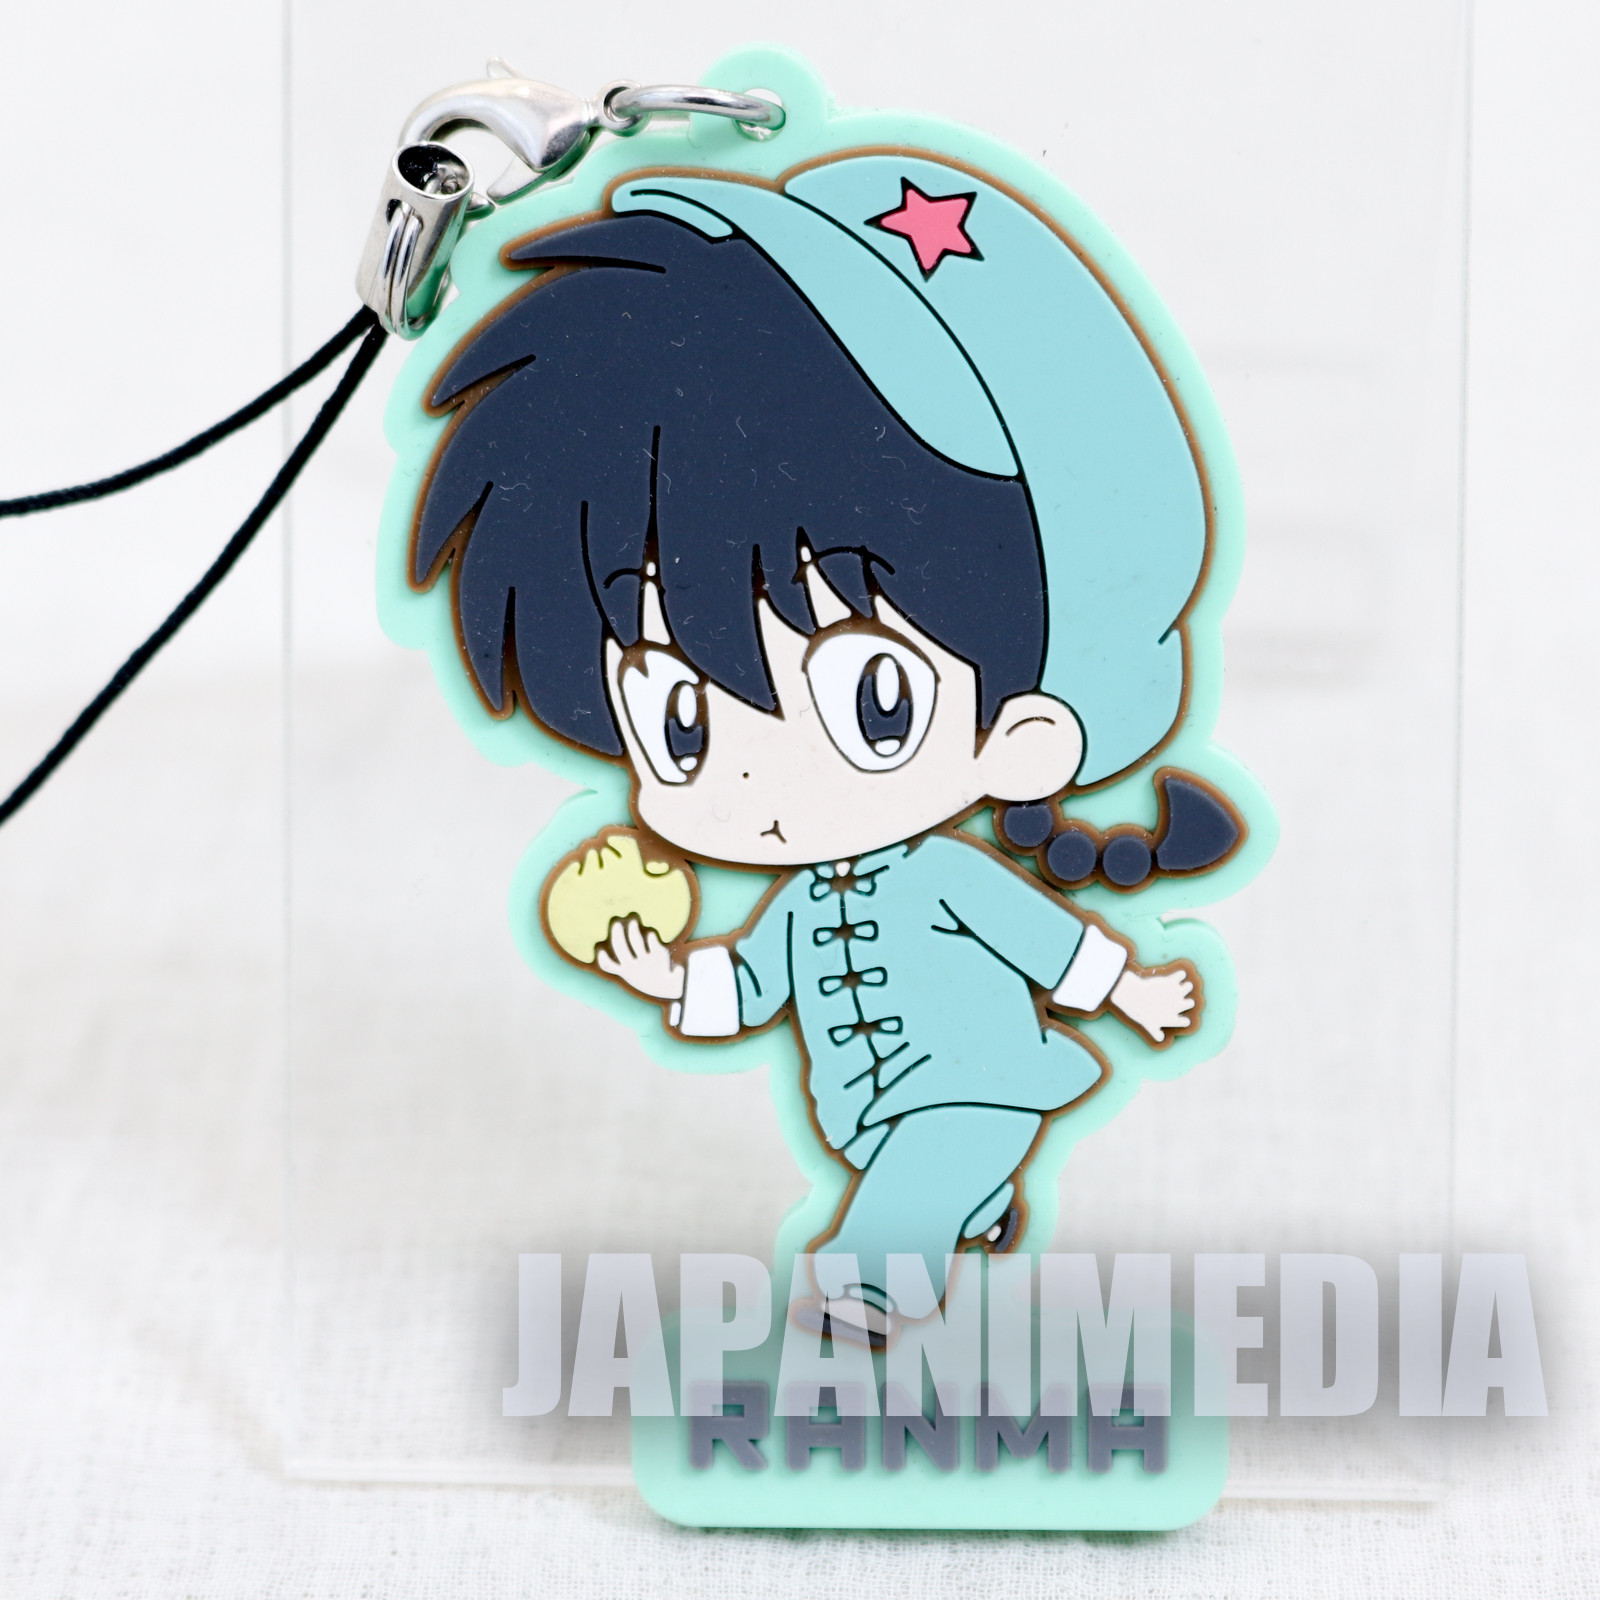 Ranma 1/2 Male Ranma Saotome #1 Mascot Rubber Strap JAPAN ANIME MANGA